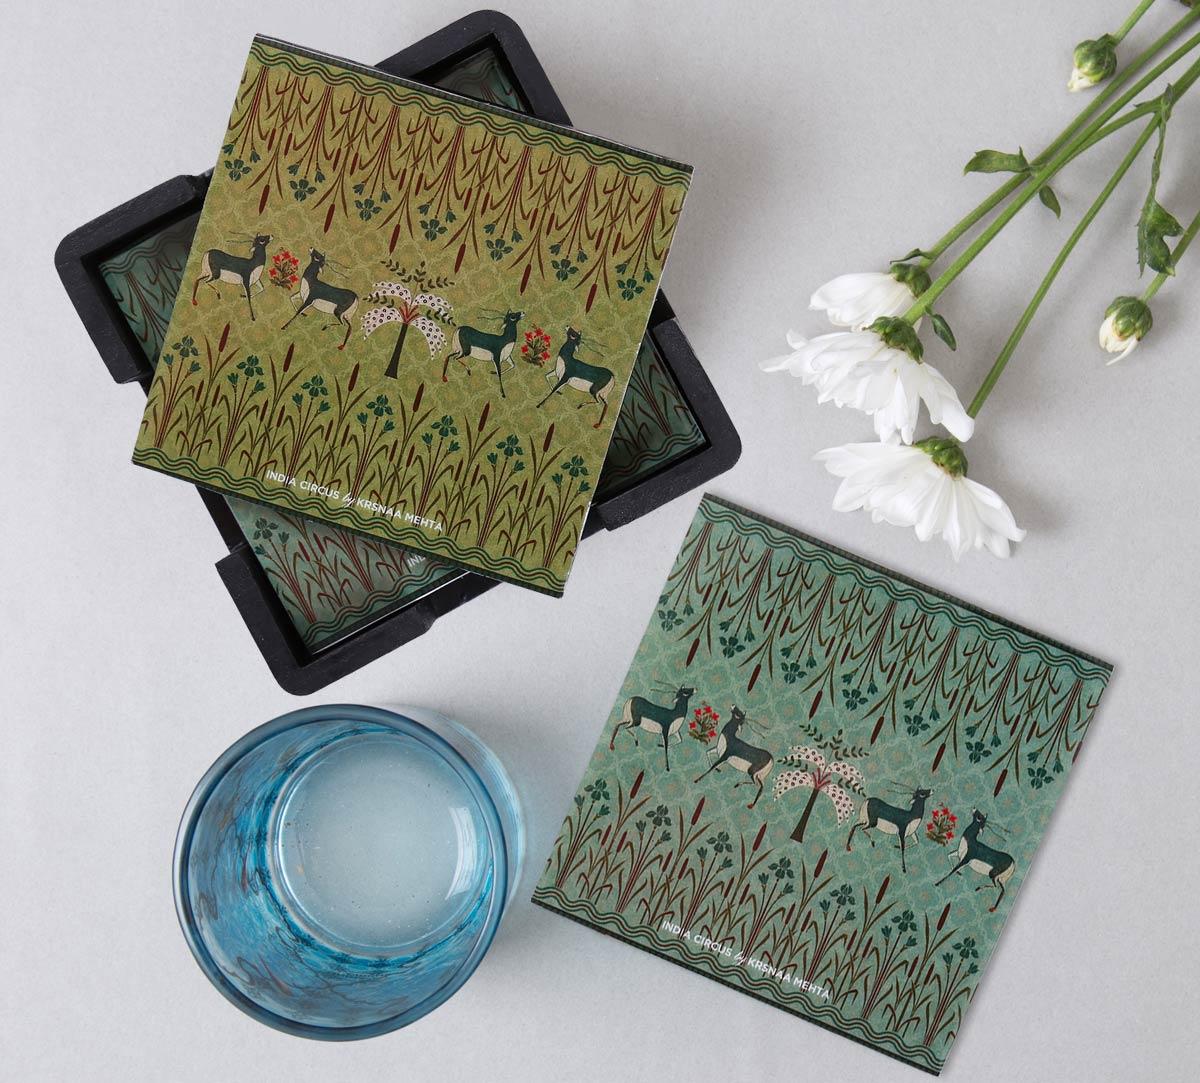 Mirroring Deer Garden MDF Table Coaster Set of 6